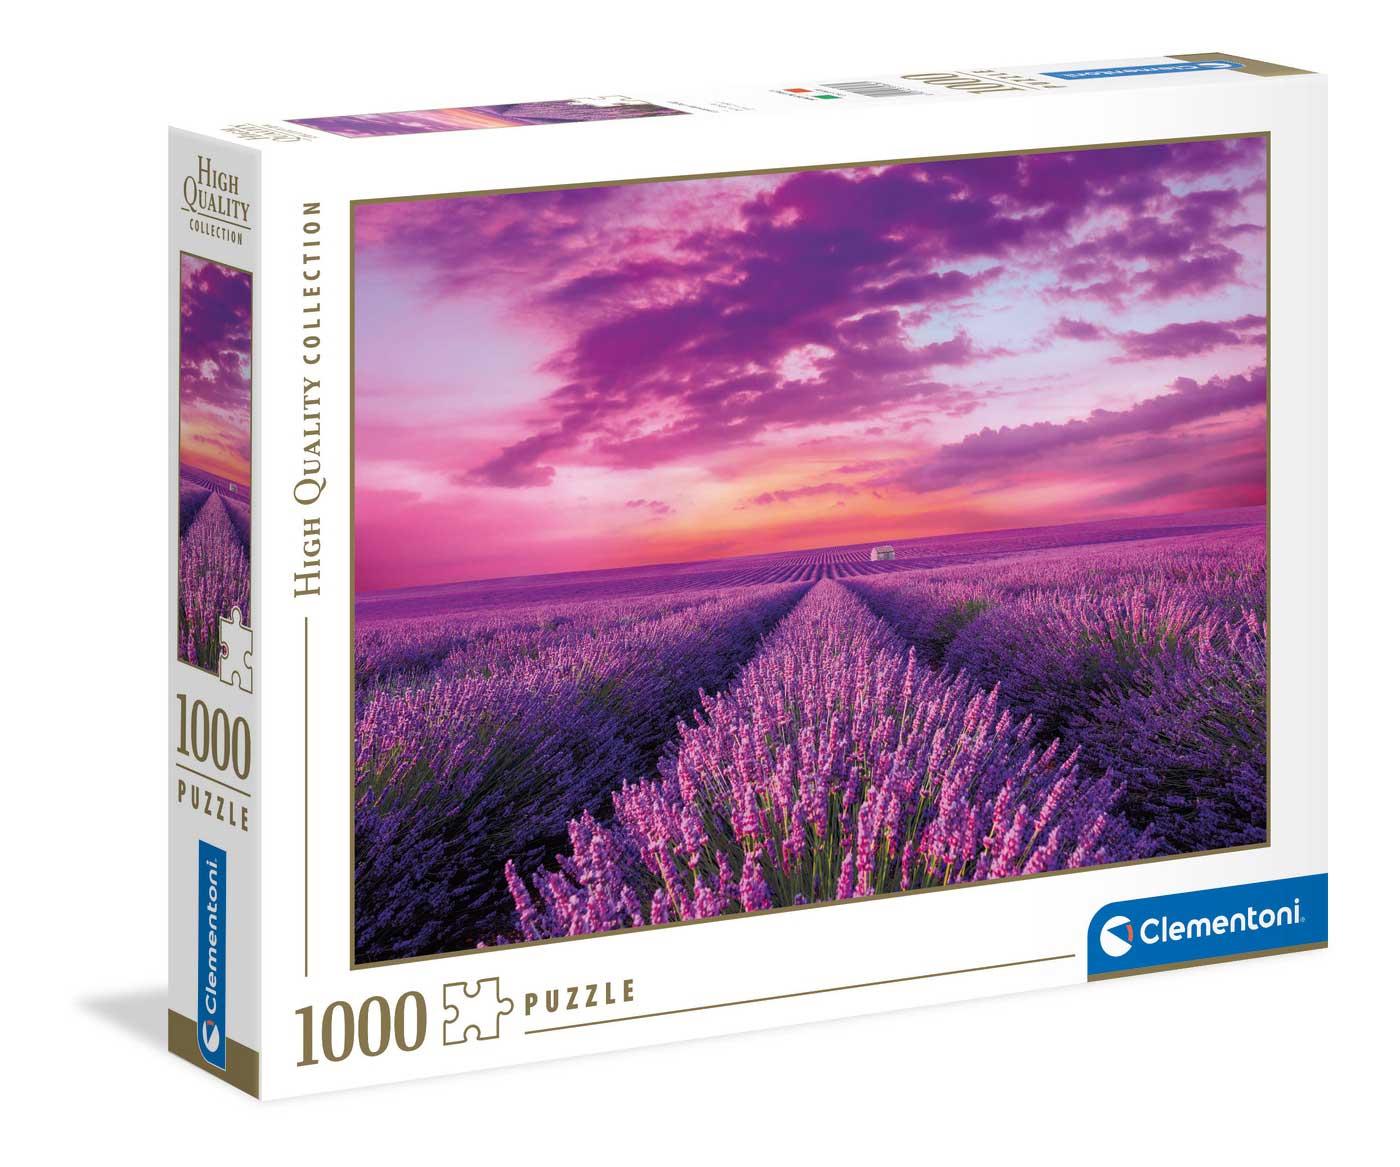 Puzzle Clementoni Campo de Lavandas de 1000 Piezas